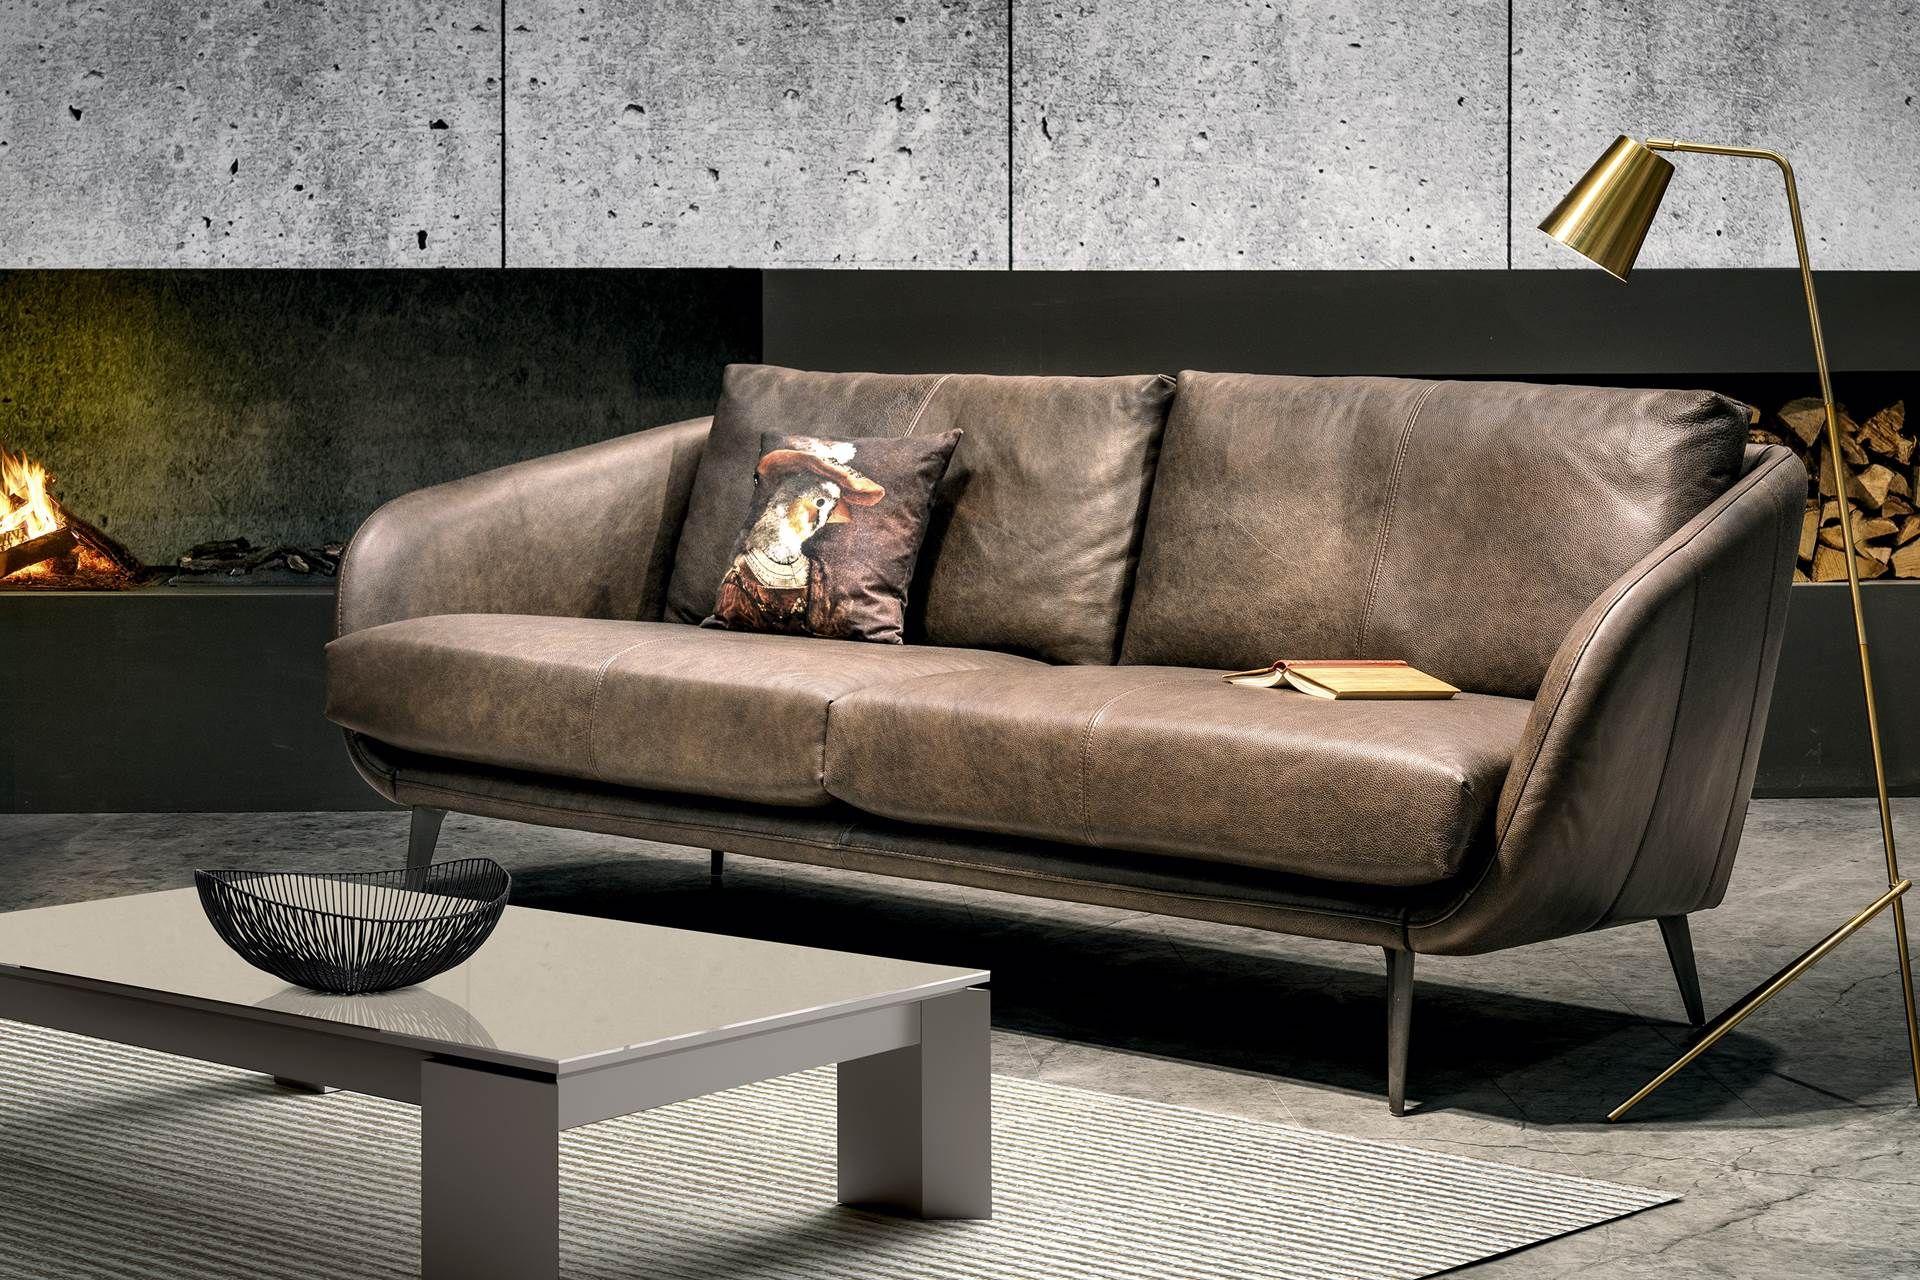 Canape Design Annees 60 Canape Design Bout De Canape Design